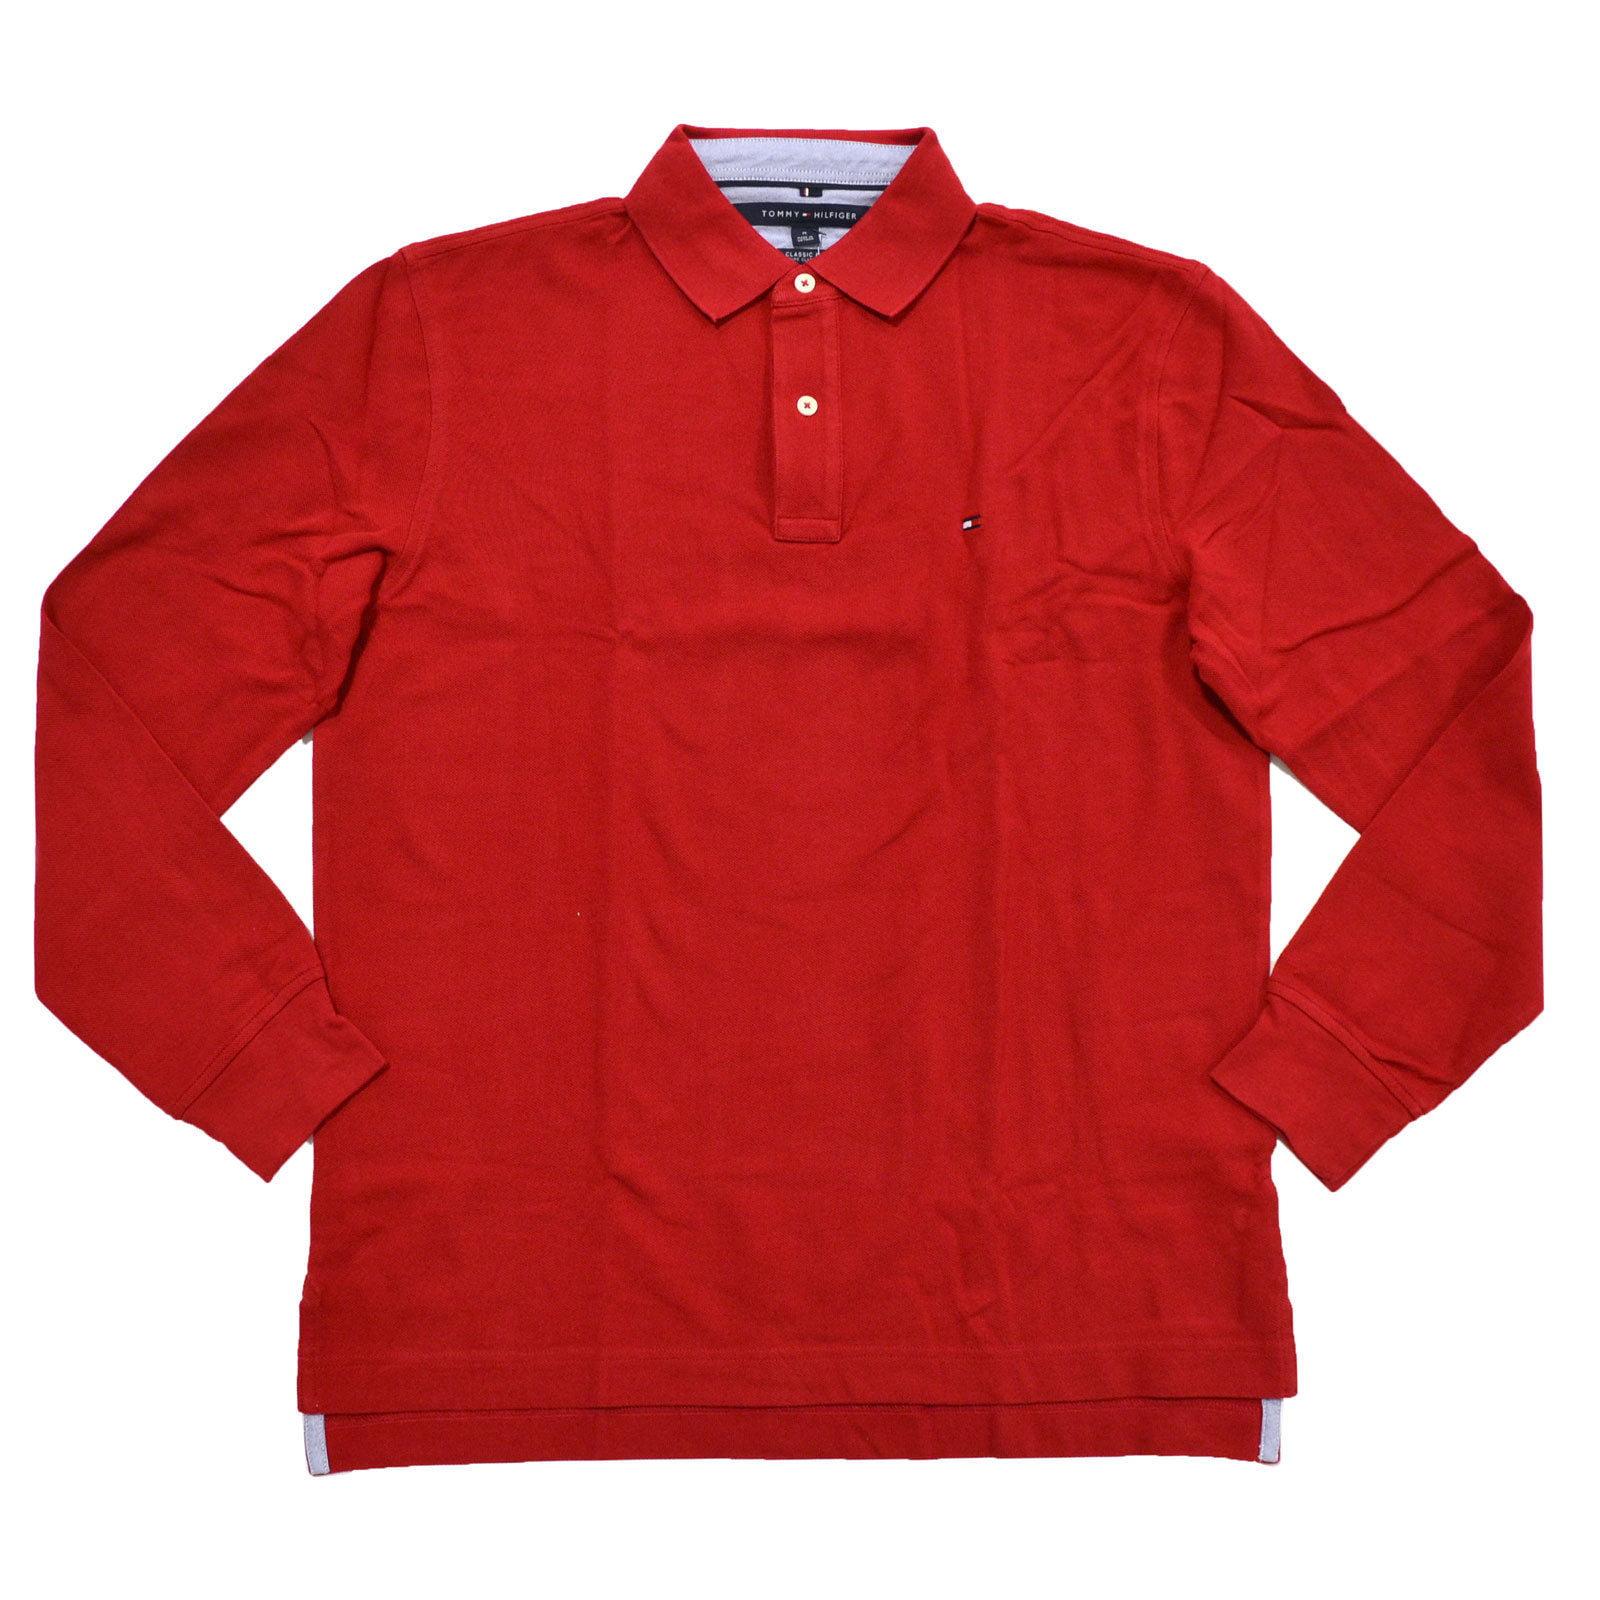 Tommy Hilfiger Mens Long Sleeve Mesh Polo Shirt